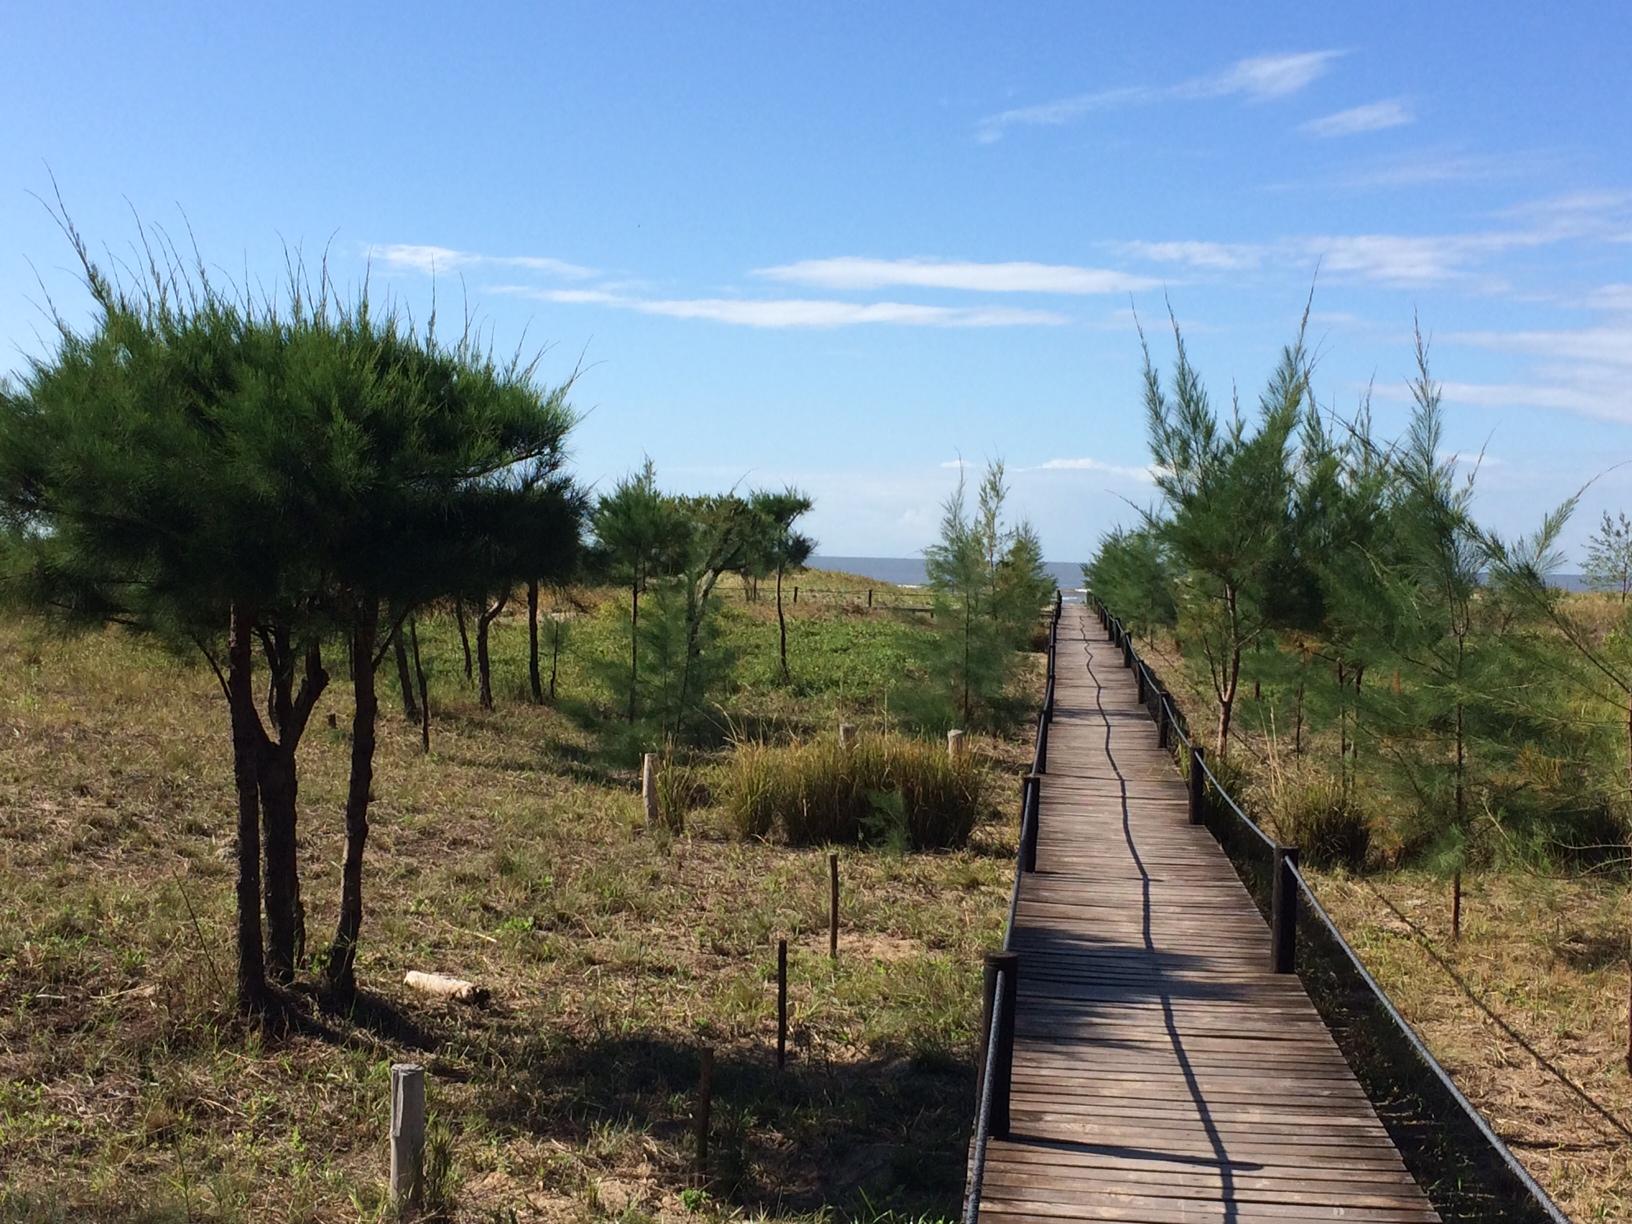 The beach pathway